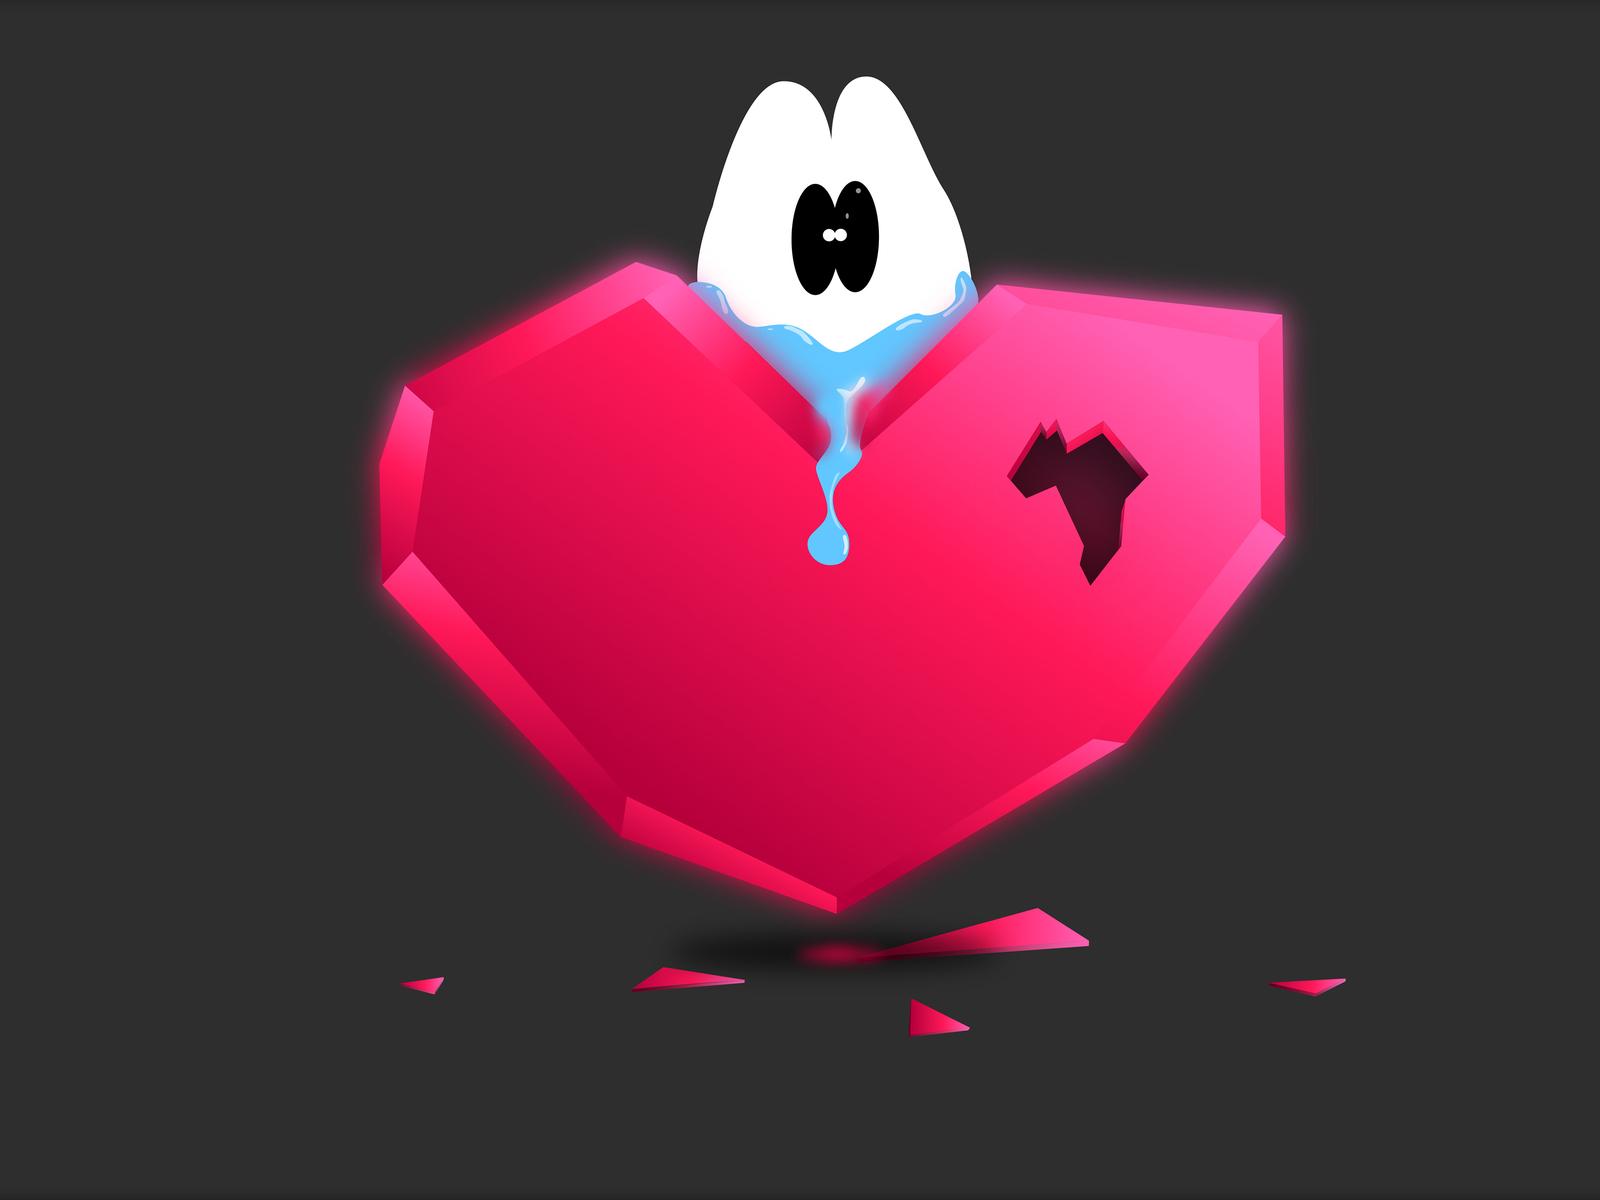 следующий картинки разбитое сердце со слезами собрали самые